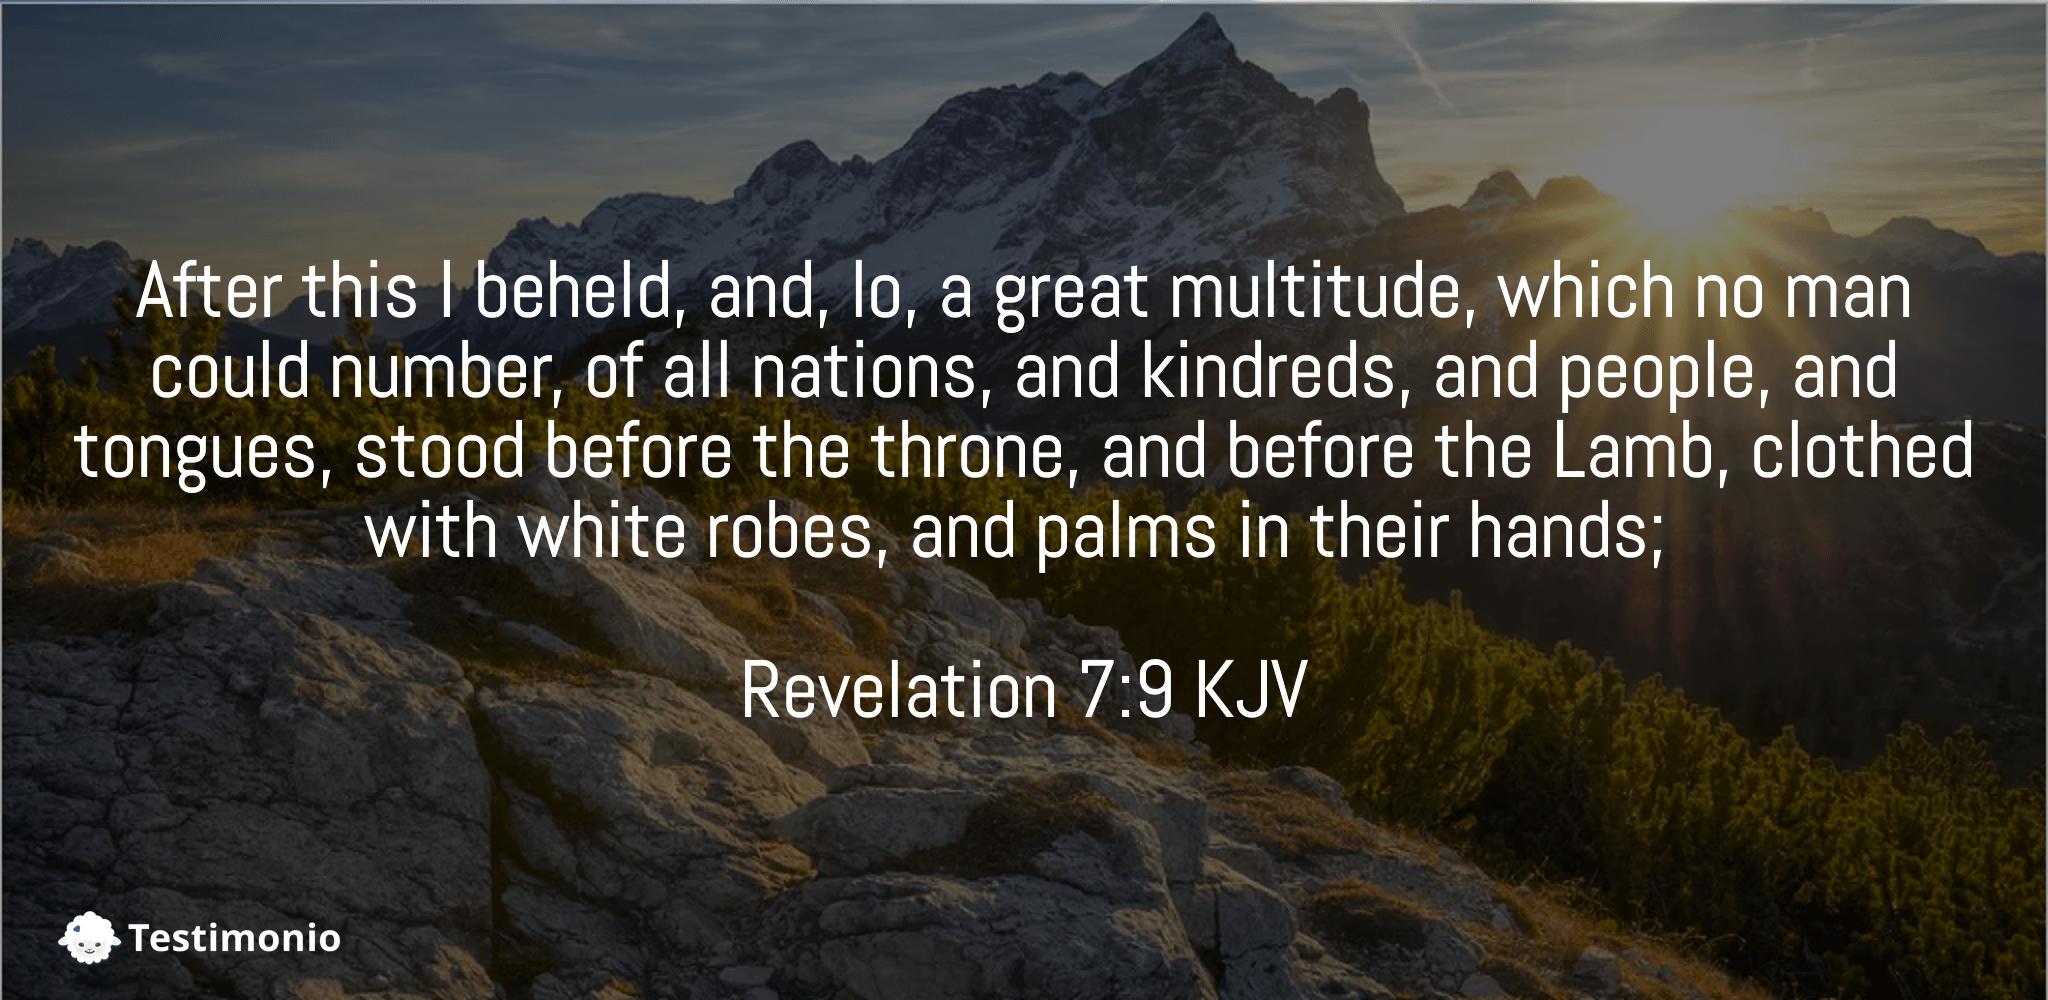 Revelation 7:9